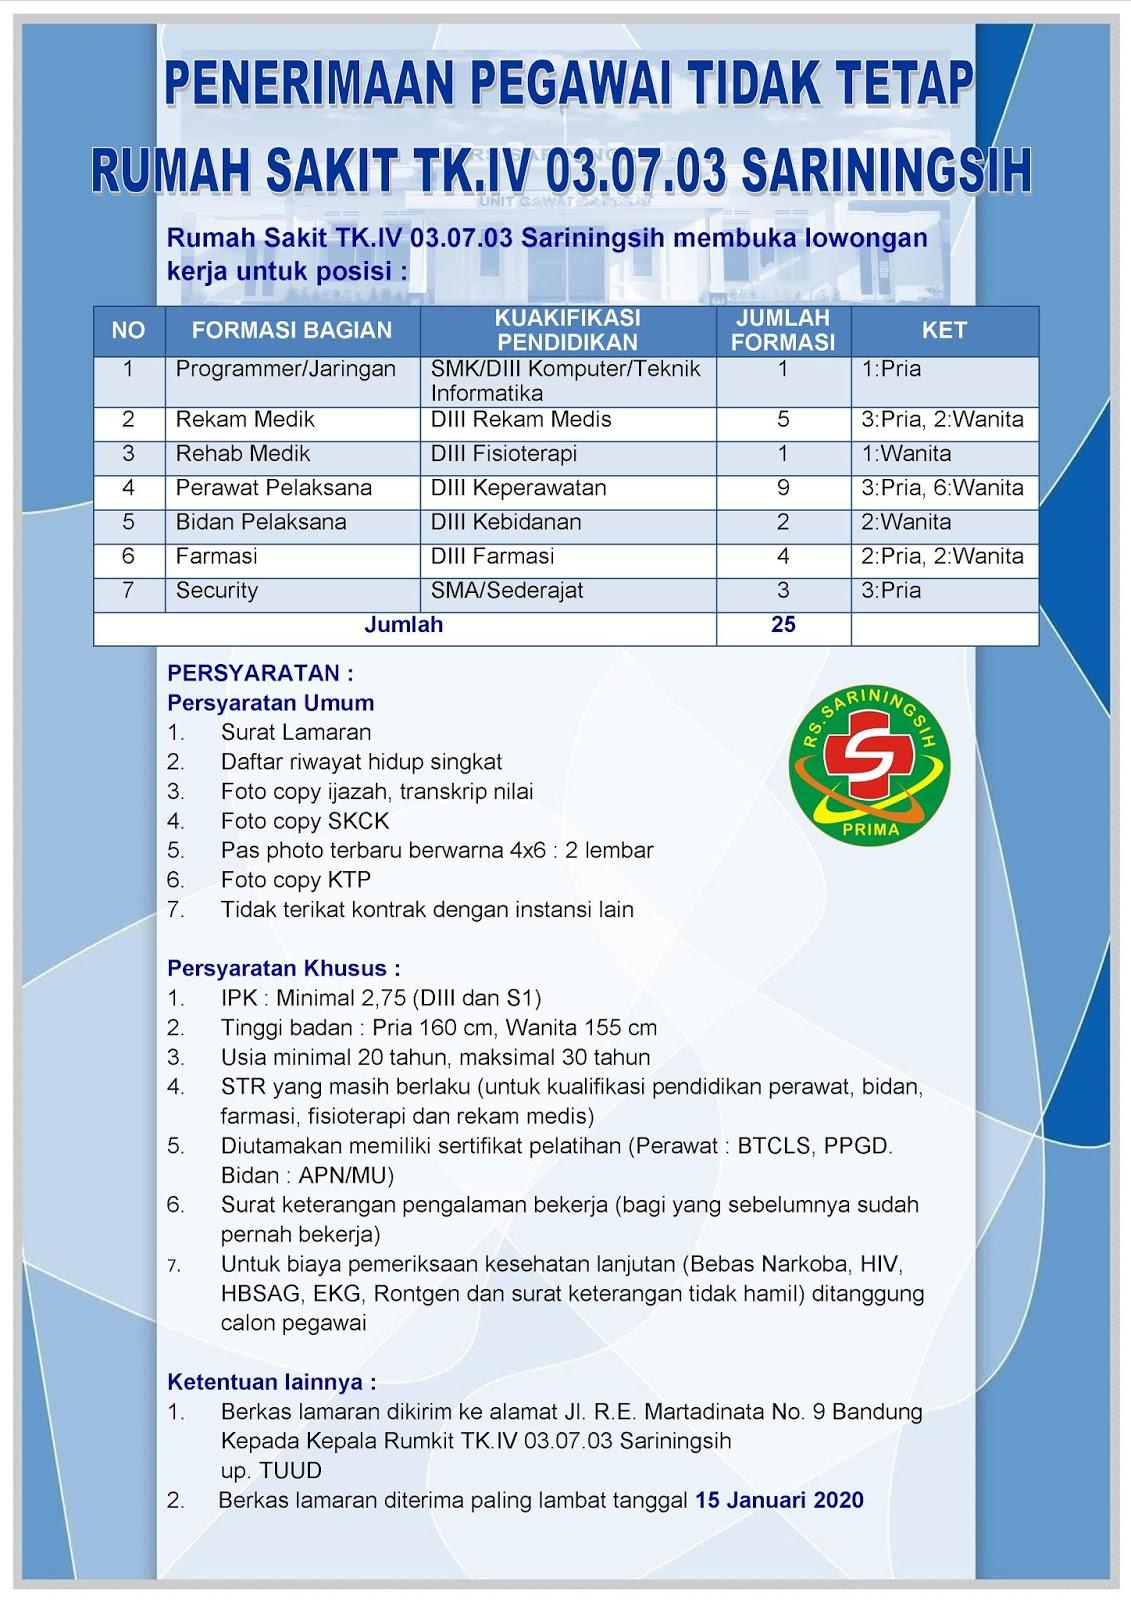 Penerimaan Pegawai Tidak Tetap Rumah Sakit Tk Iv 03 07 03 Sariningsih Bandung Januari 2020 Rekrutmen Dan Lowongan Kerja Bulan Februari 2021